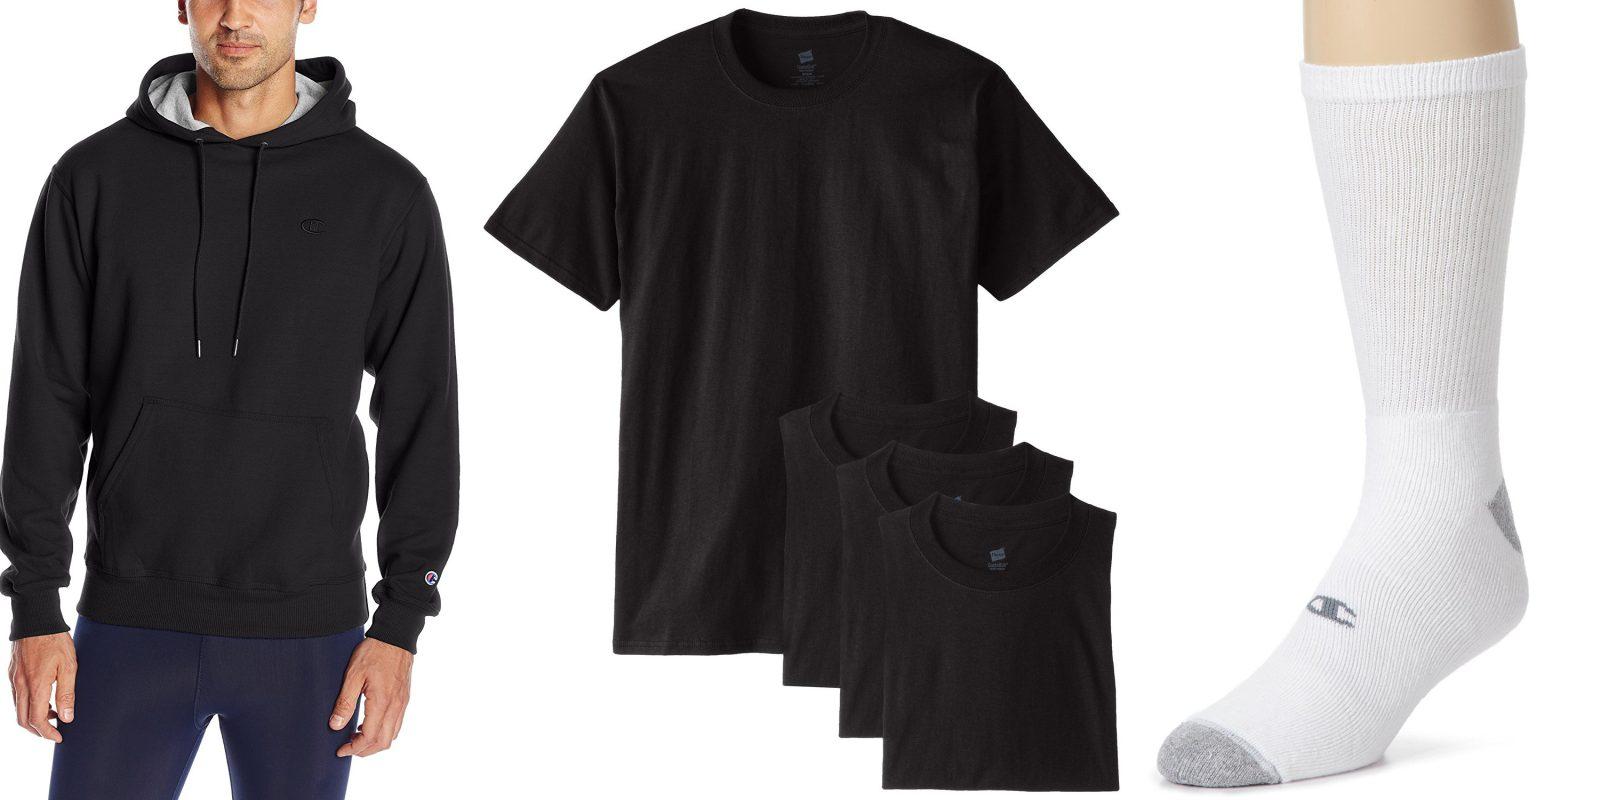 58f0d0fd779e8 Amazon 1-Day Activewear/Basics Apparel sale: 10-Pack Hanes Socks $10 ...